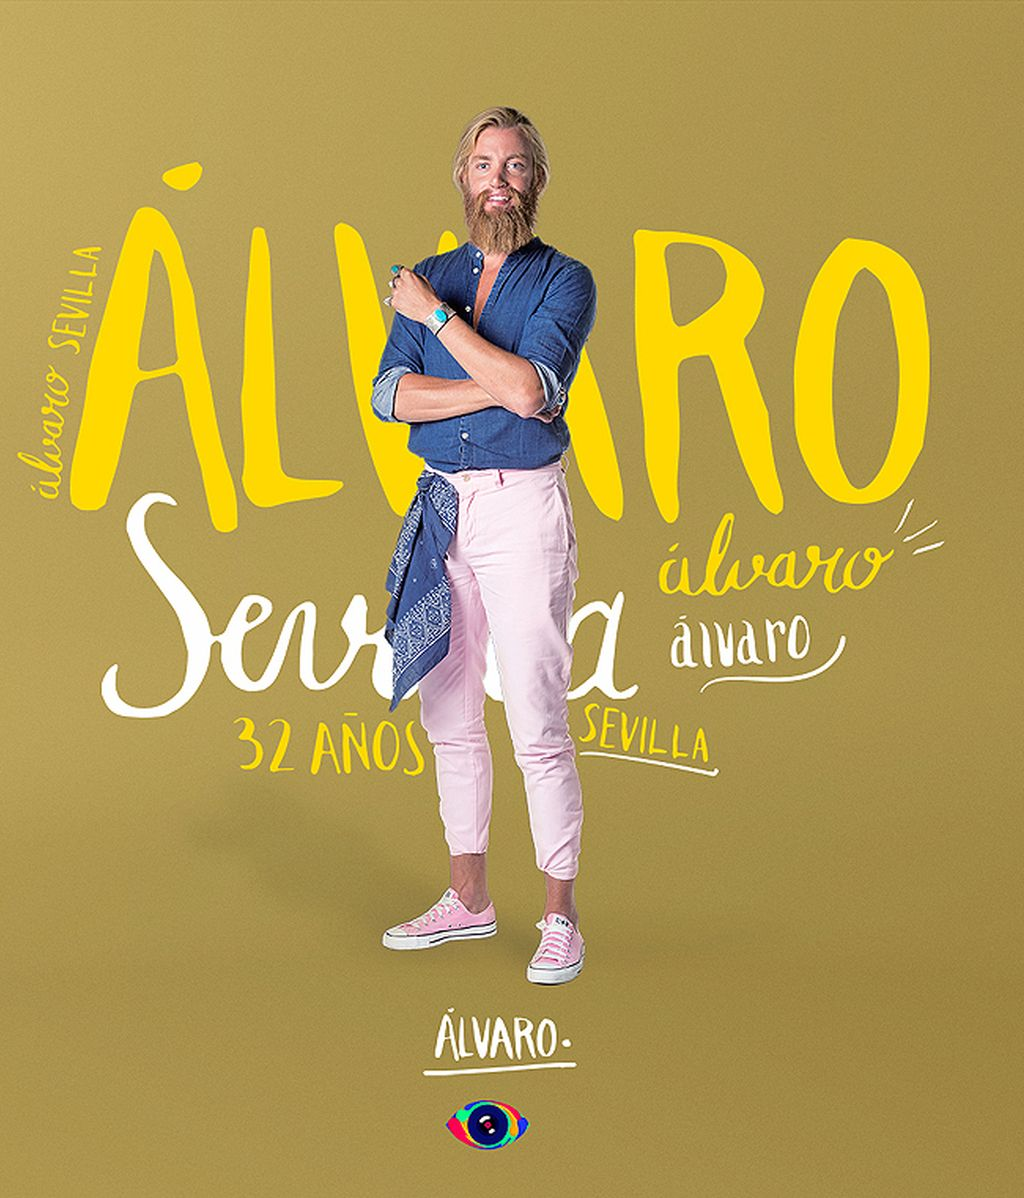 Álvaro, 32 años (Sevilla)